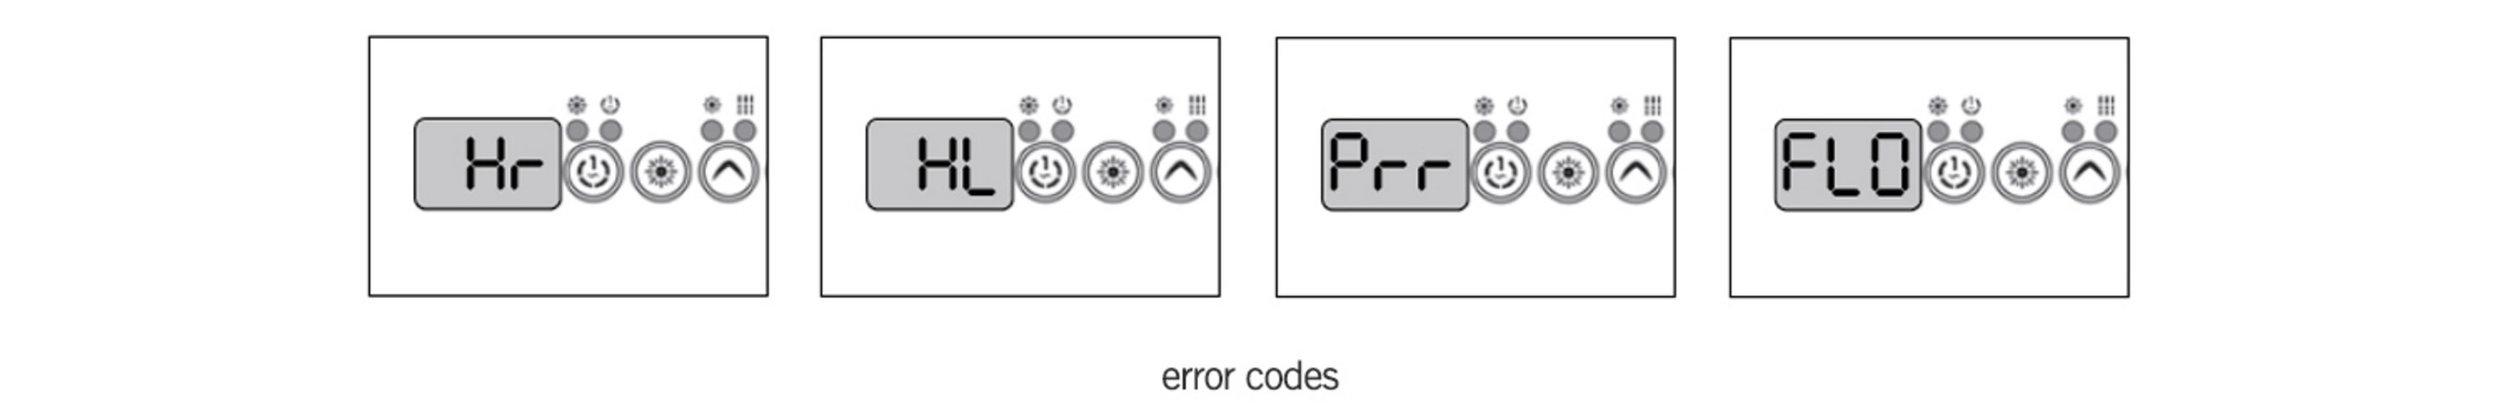 troubleshooting_error_code.jpg